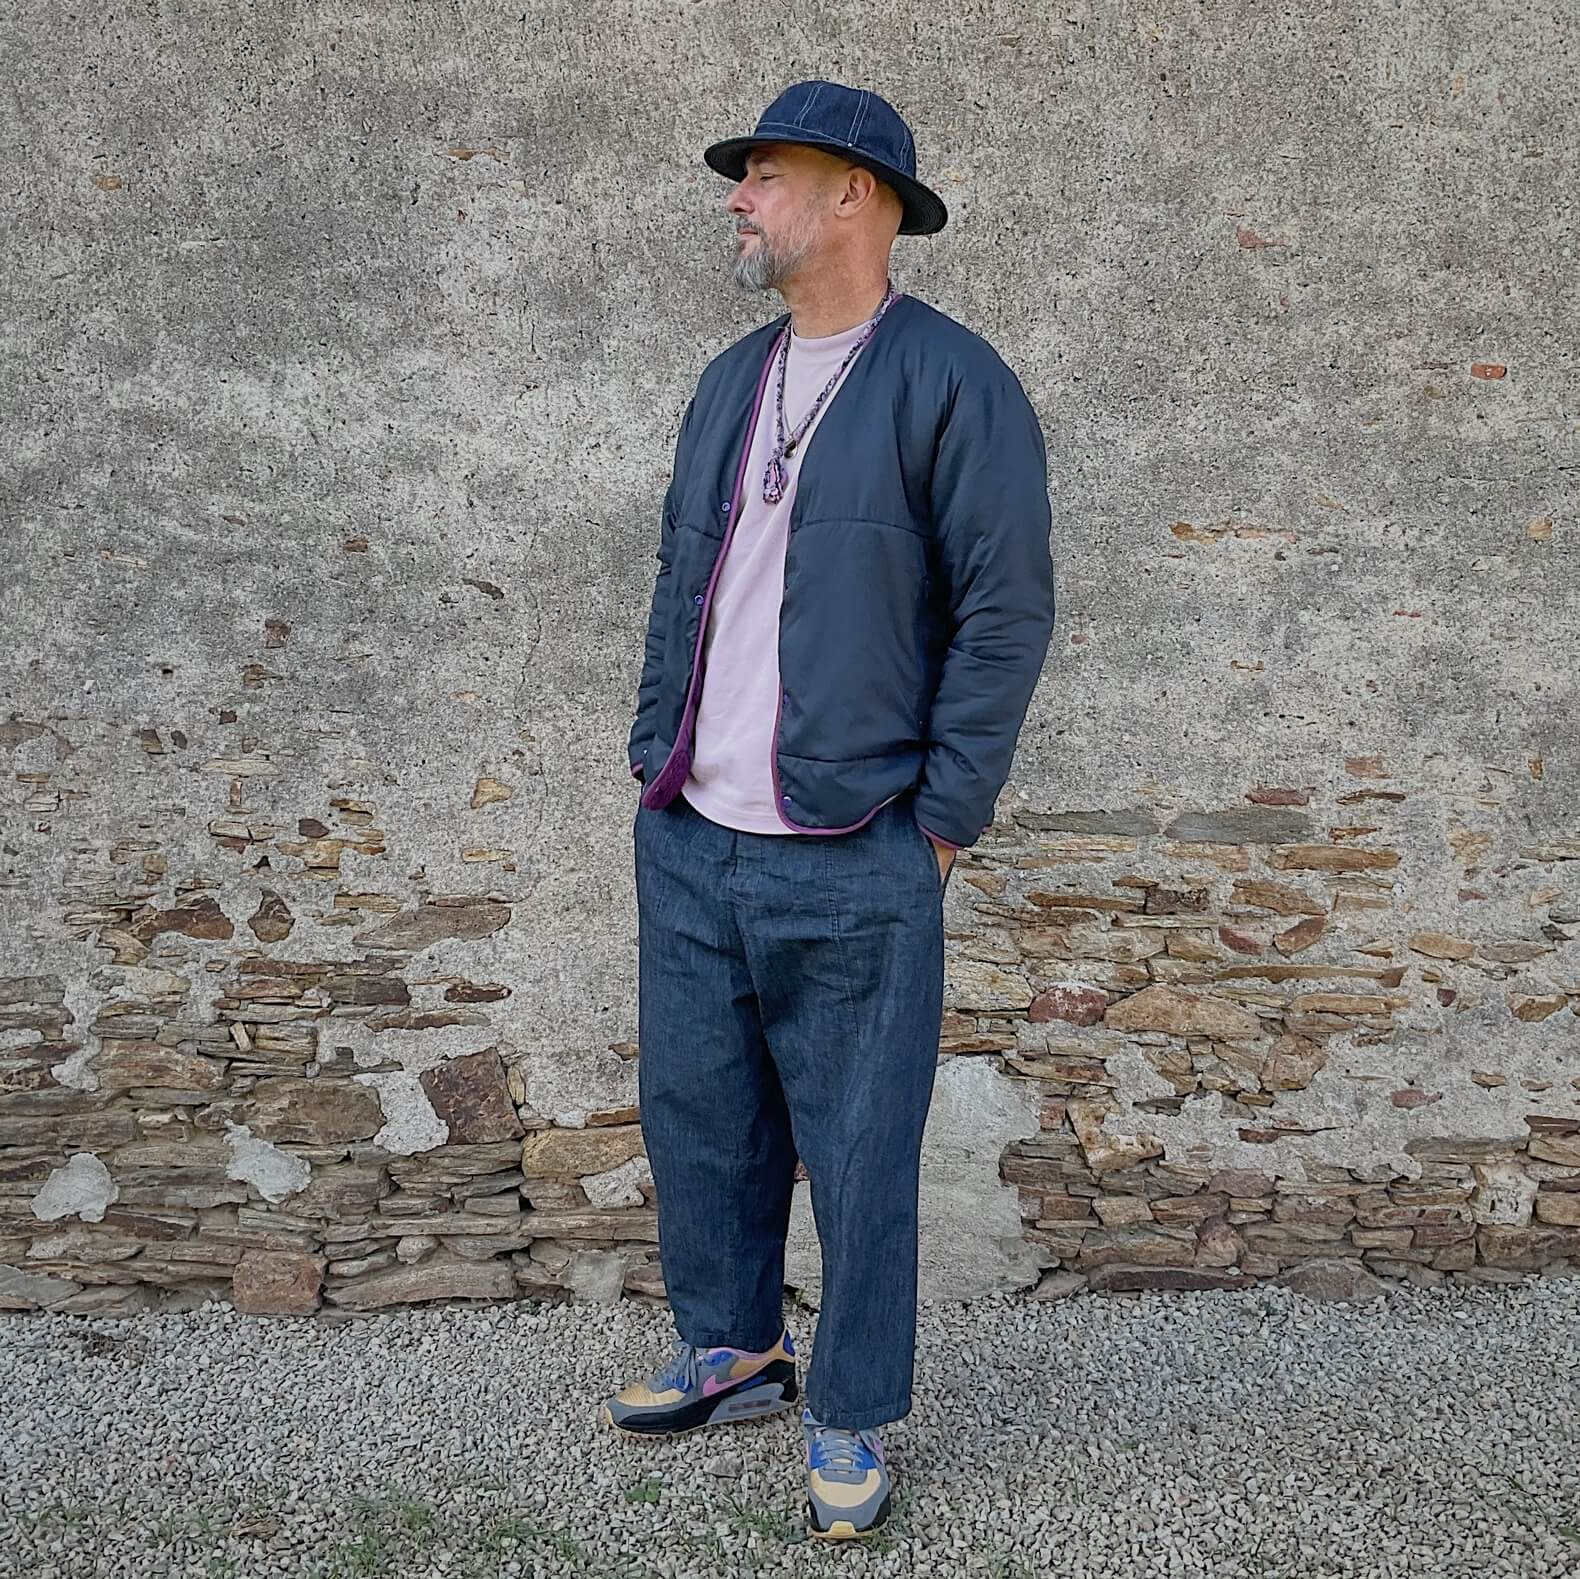 look-homme-fleece-comfy-outdoor-garments-pantalon-oversize-anglan-shop 2